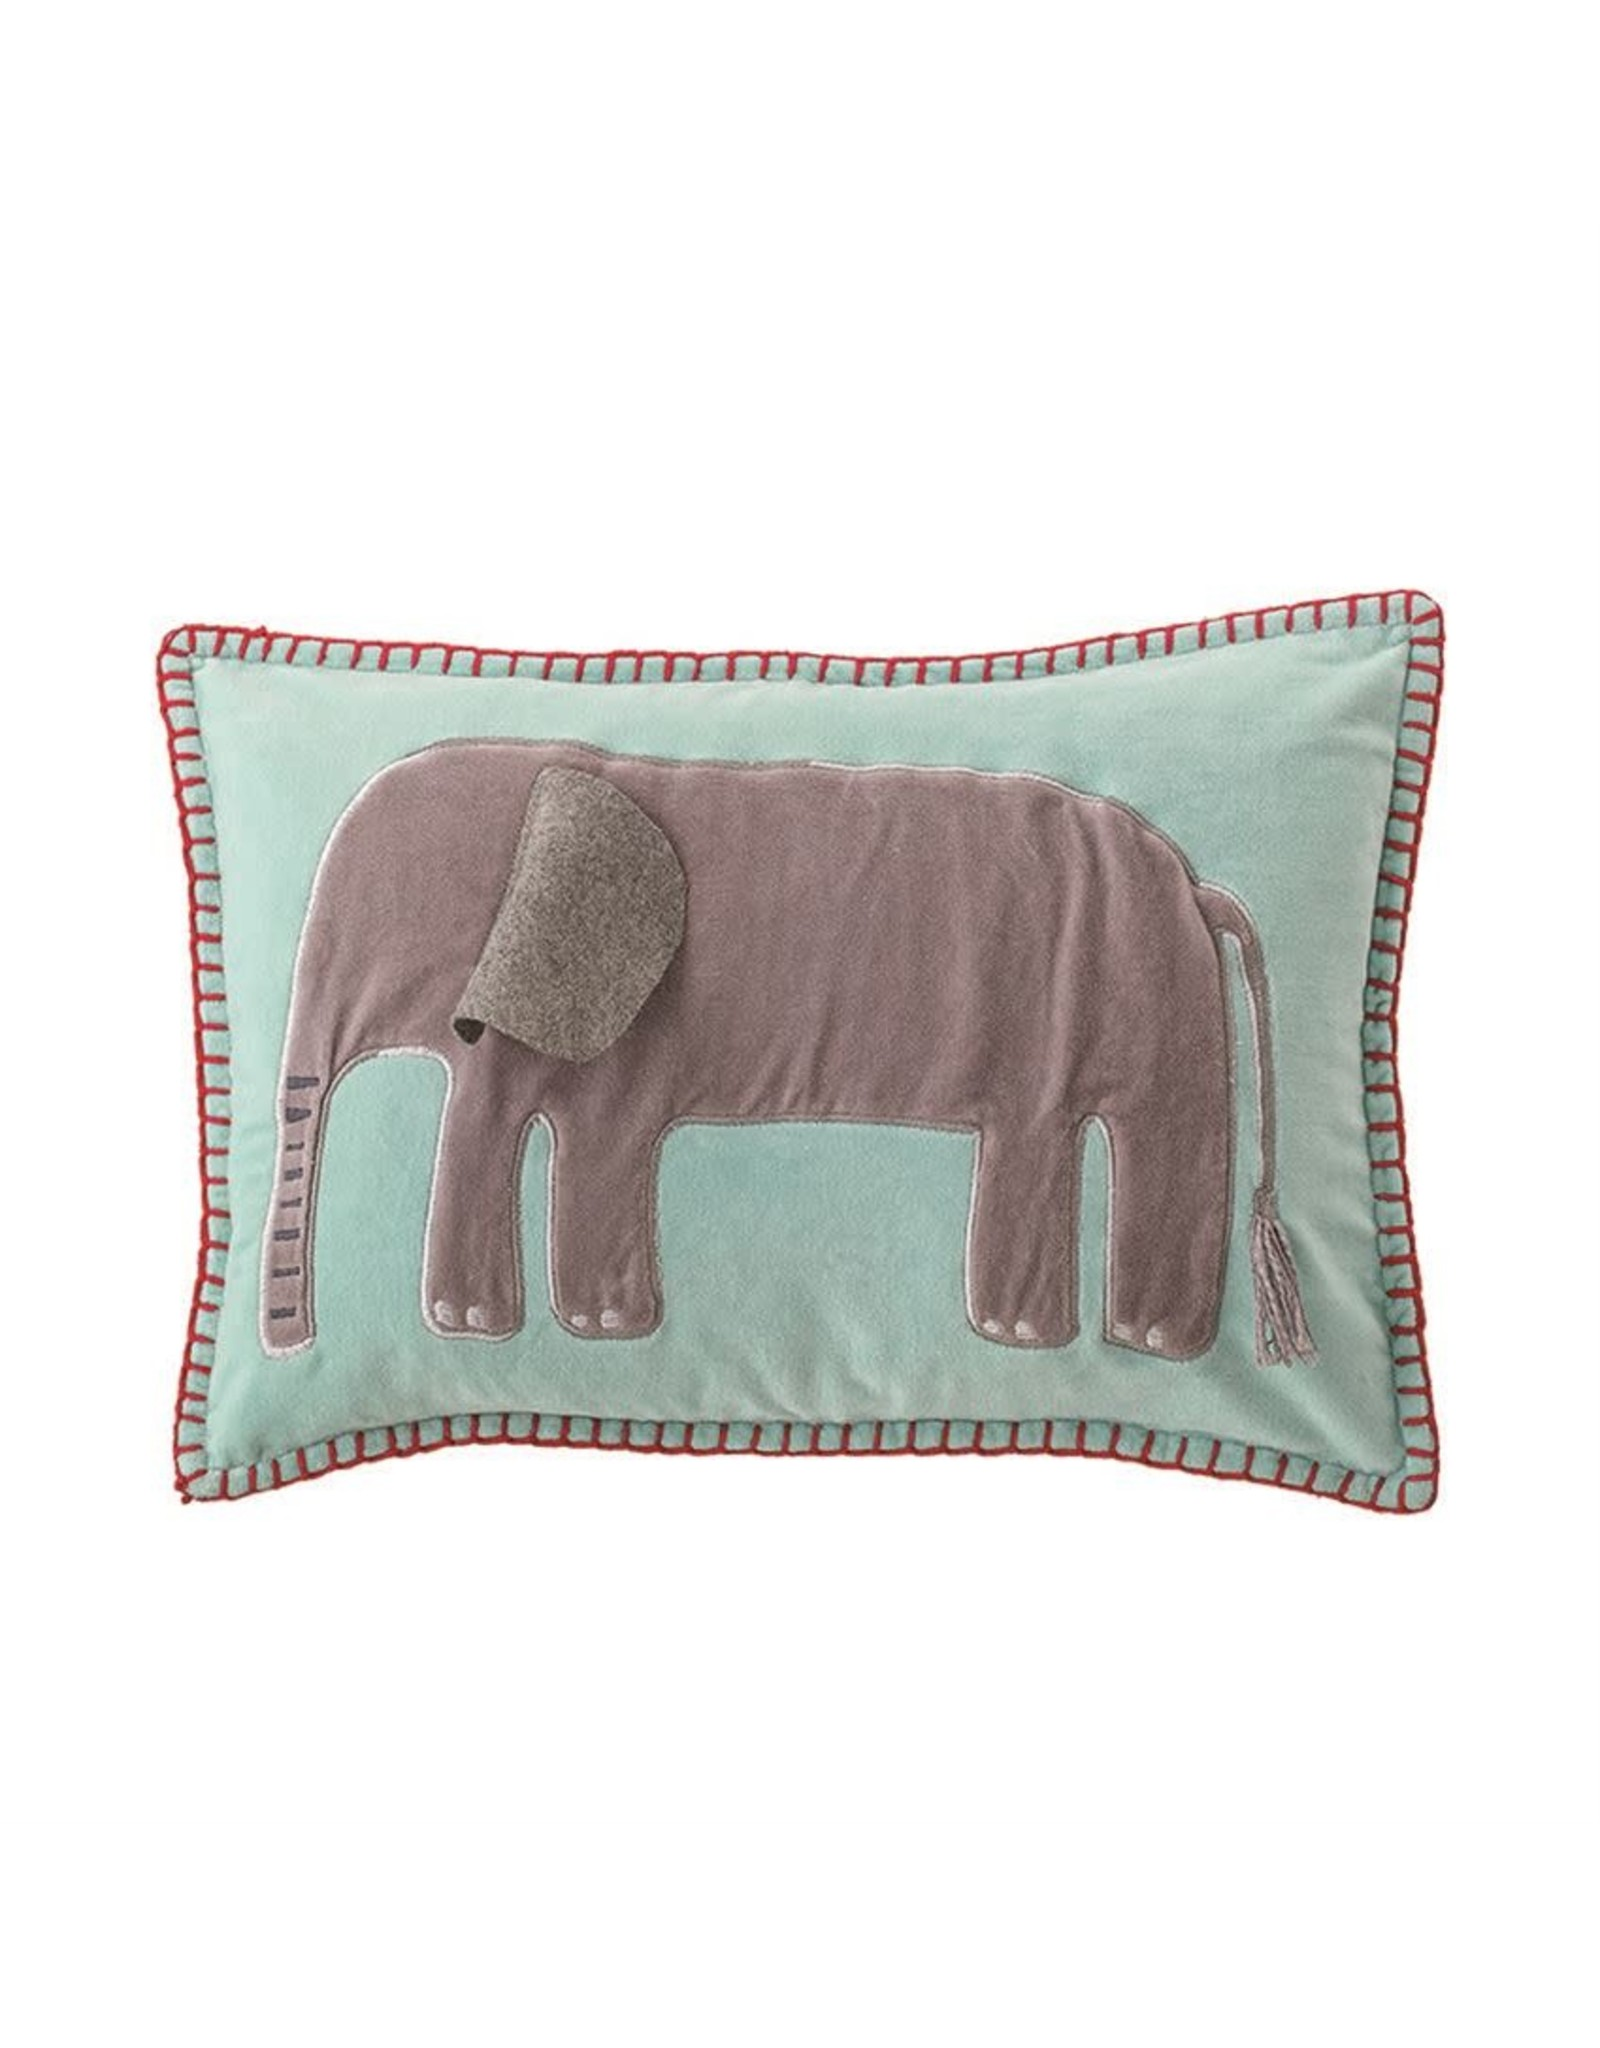 "Bloomingville 18""L x 12""H Cotton Velvet Embroidered & Appliqued Pillow w/ Elephant"